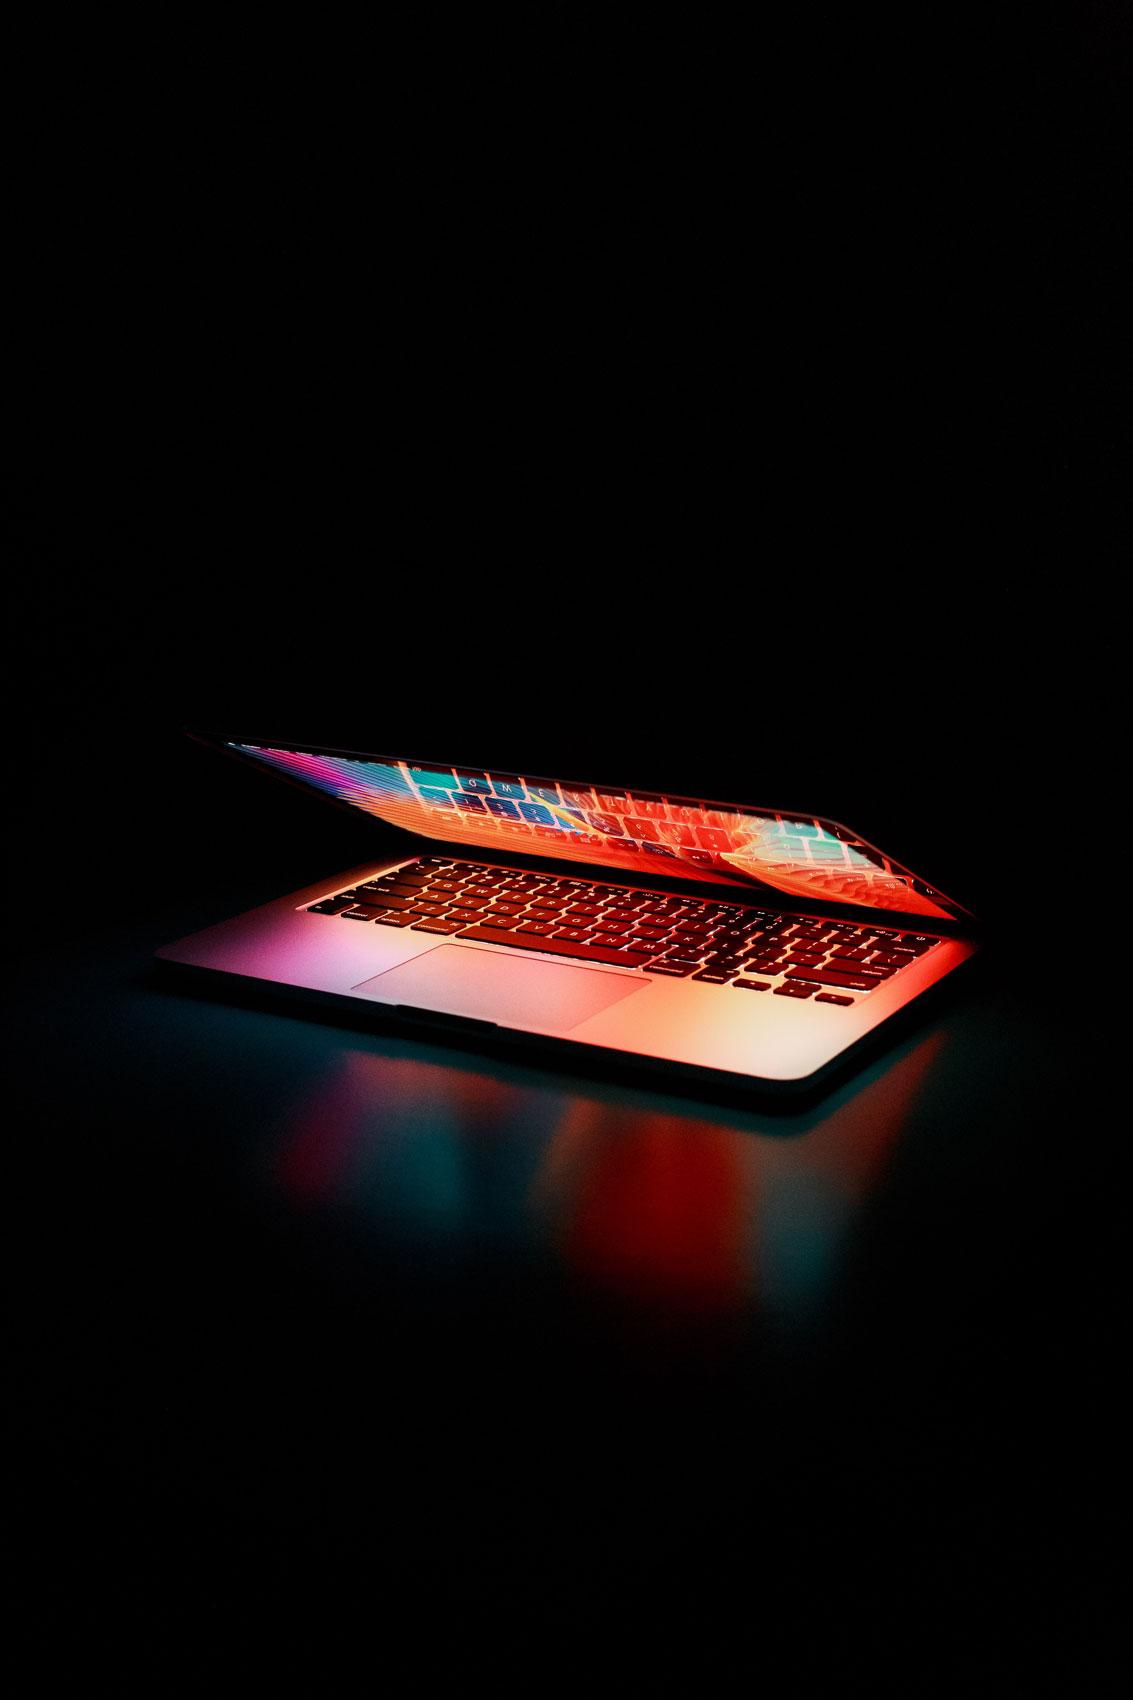 Laptop mid opened